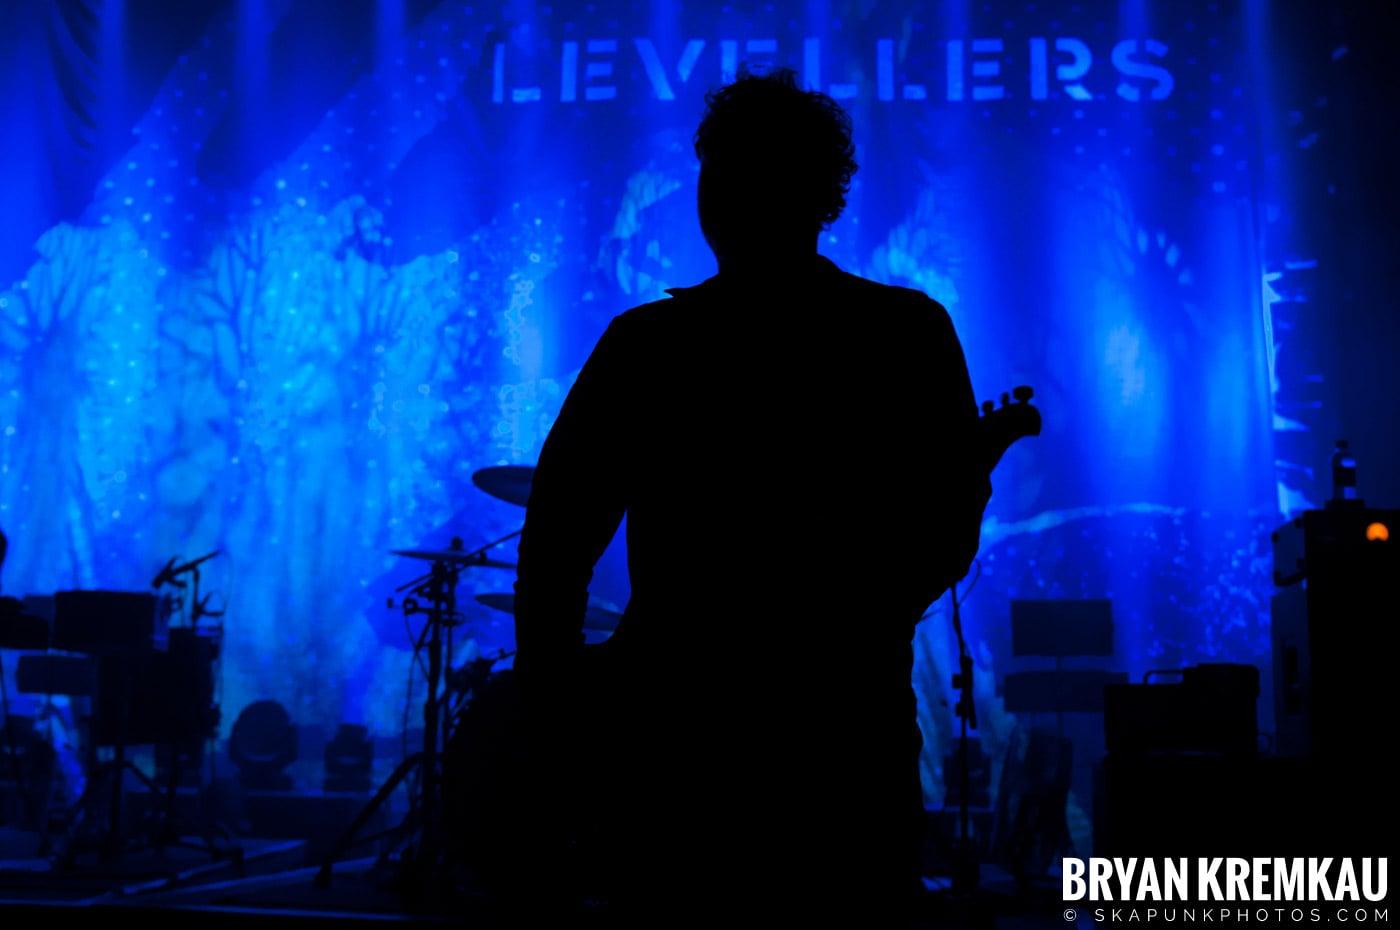 The Levellers @ Shepherds Bush Empire, London UK - 11.24.12 (45)